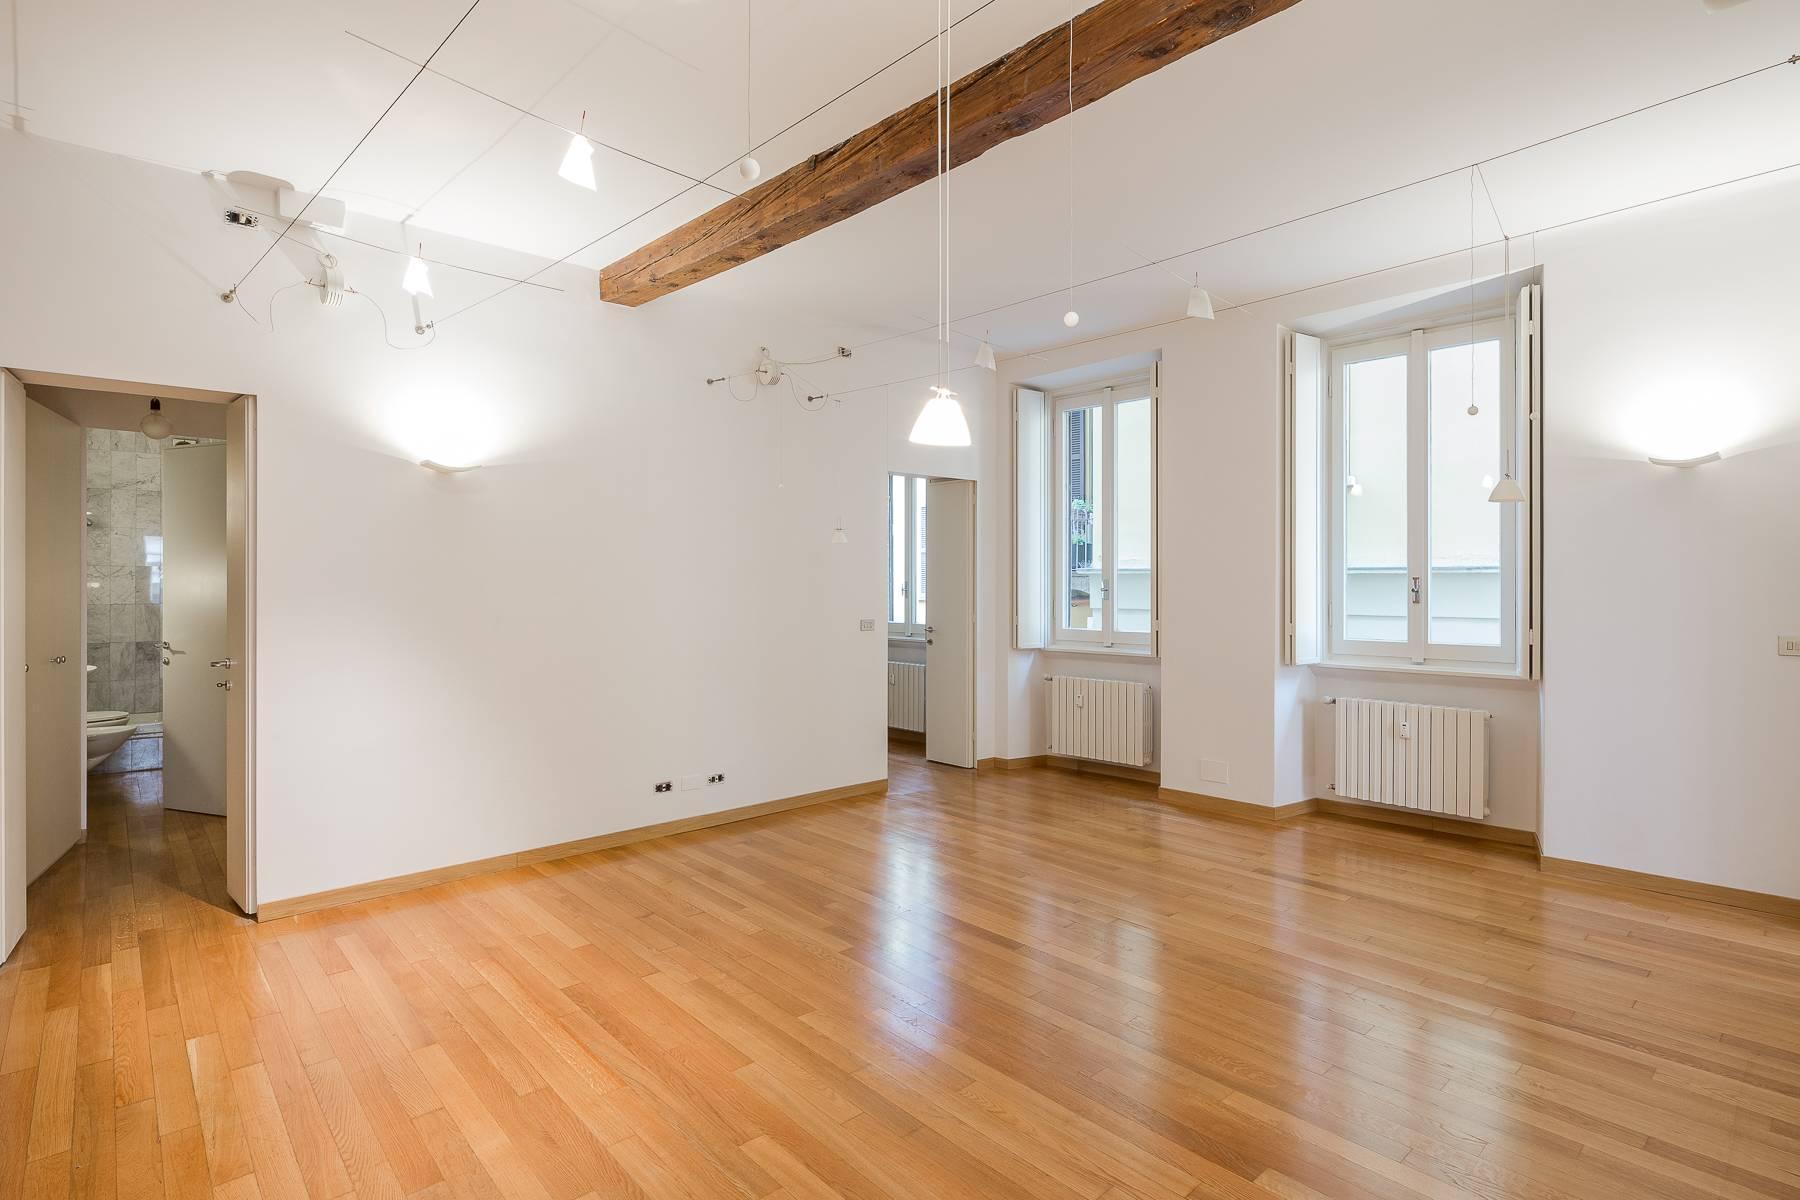 Apartment in an elegant period building located in a prestigious city district - 7